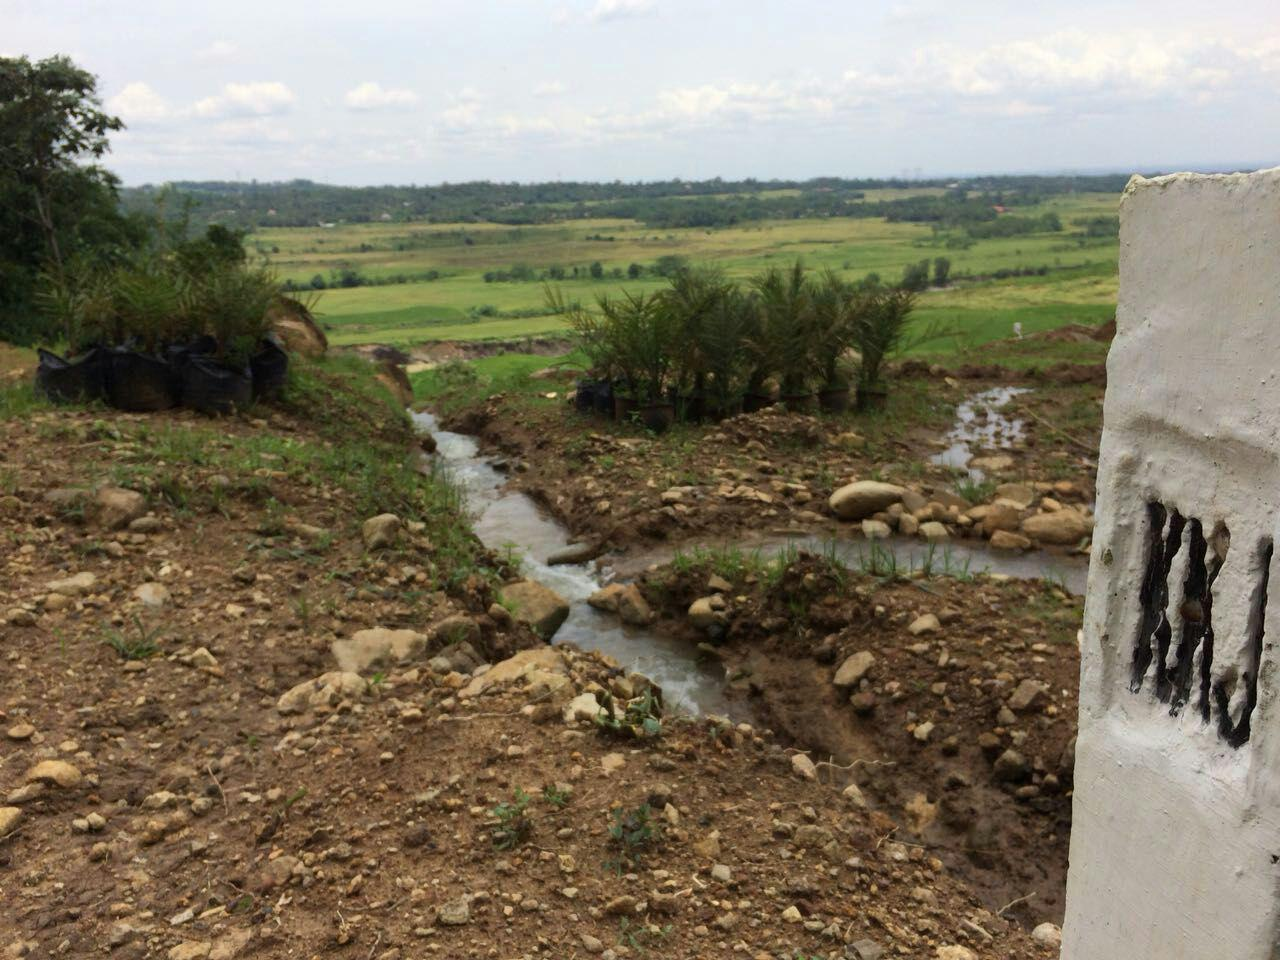 Mengintip Indahnya Kampung Kurma Sukaresmi dan Menepis Isu Penipuan Yang Beredar